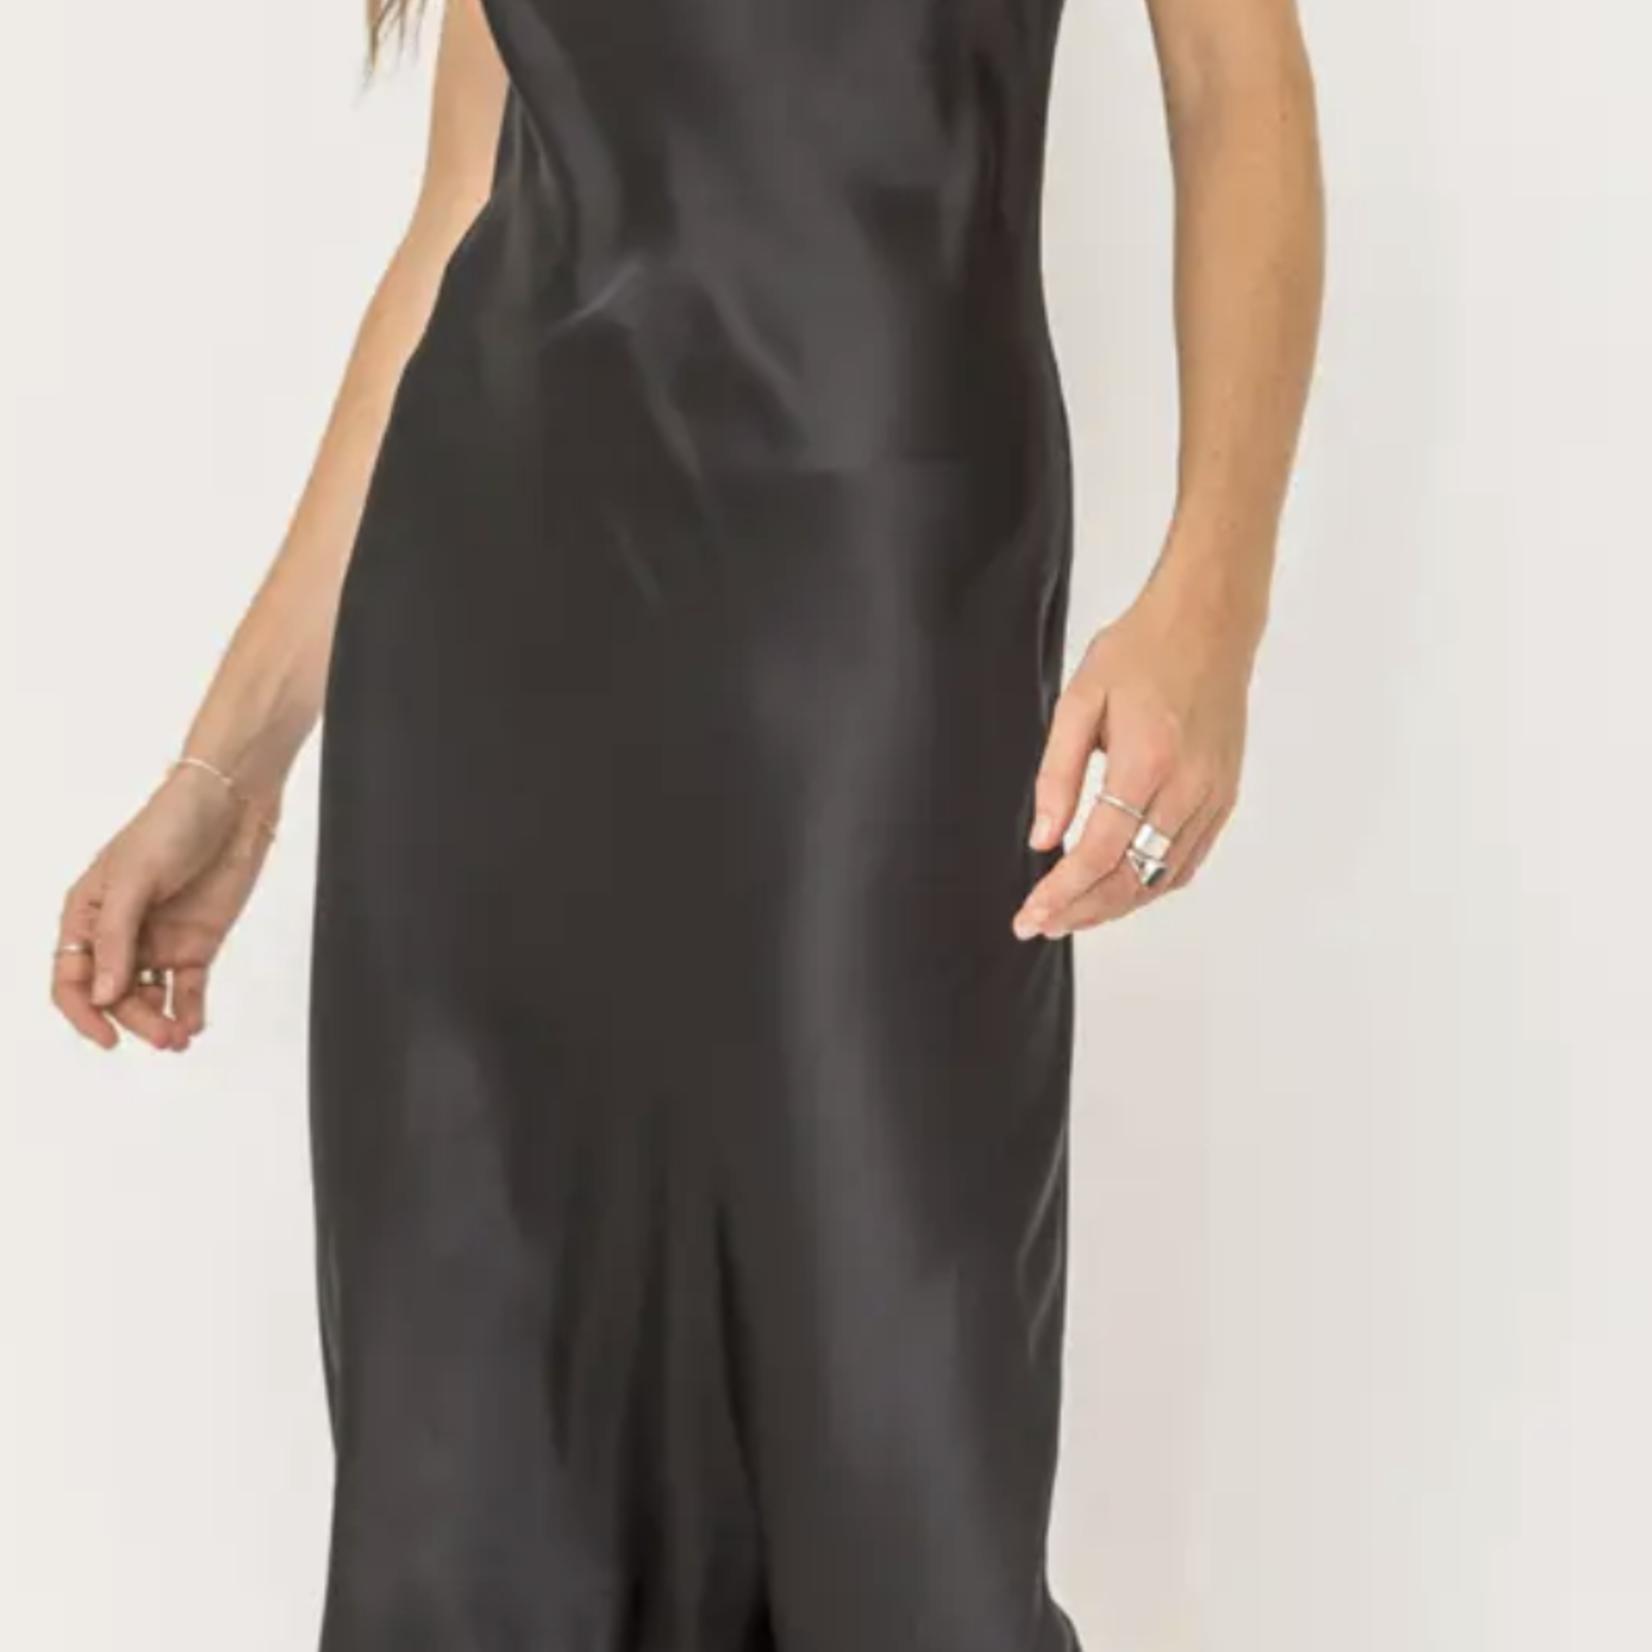 Indigo Faire Cowl Satin Dress